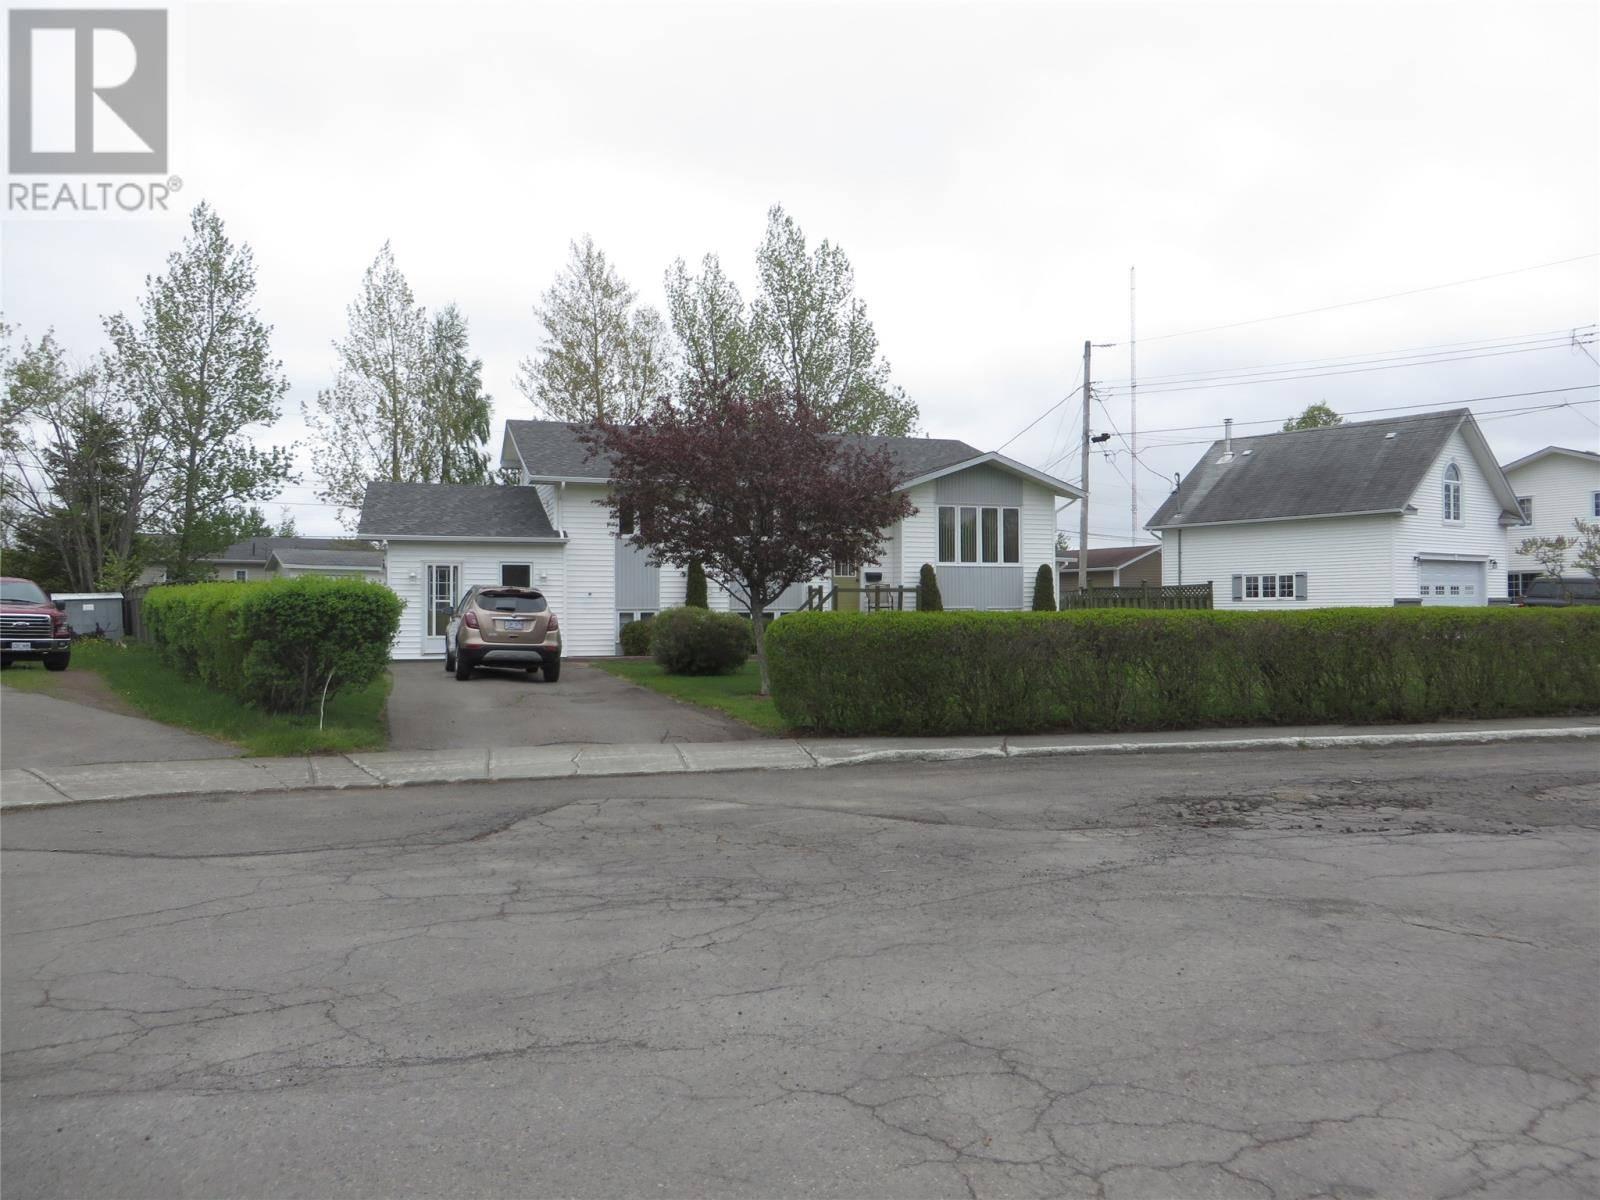 House for sale at 6 Earle Pl Grand Falls-windsor Newfoundland - MLS: 1197856